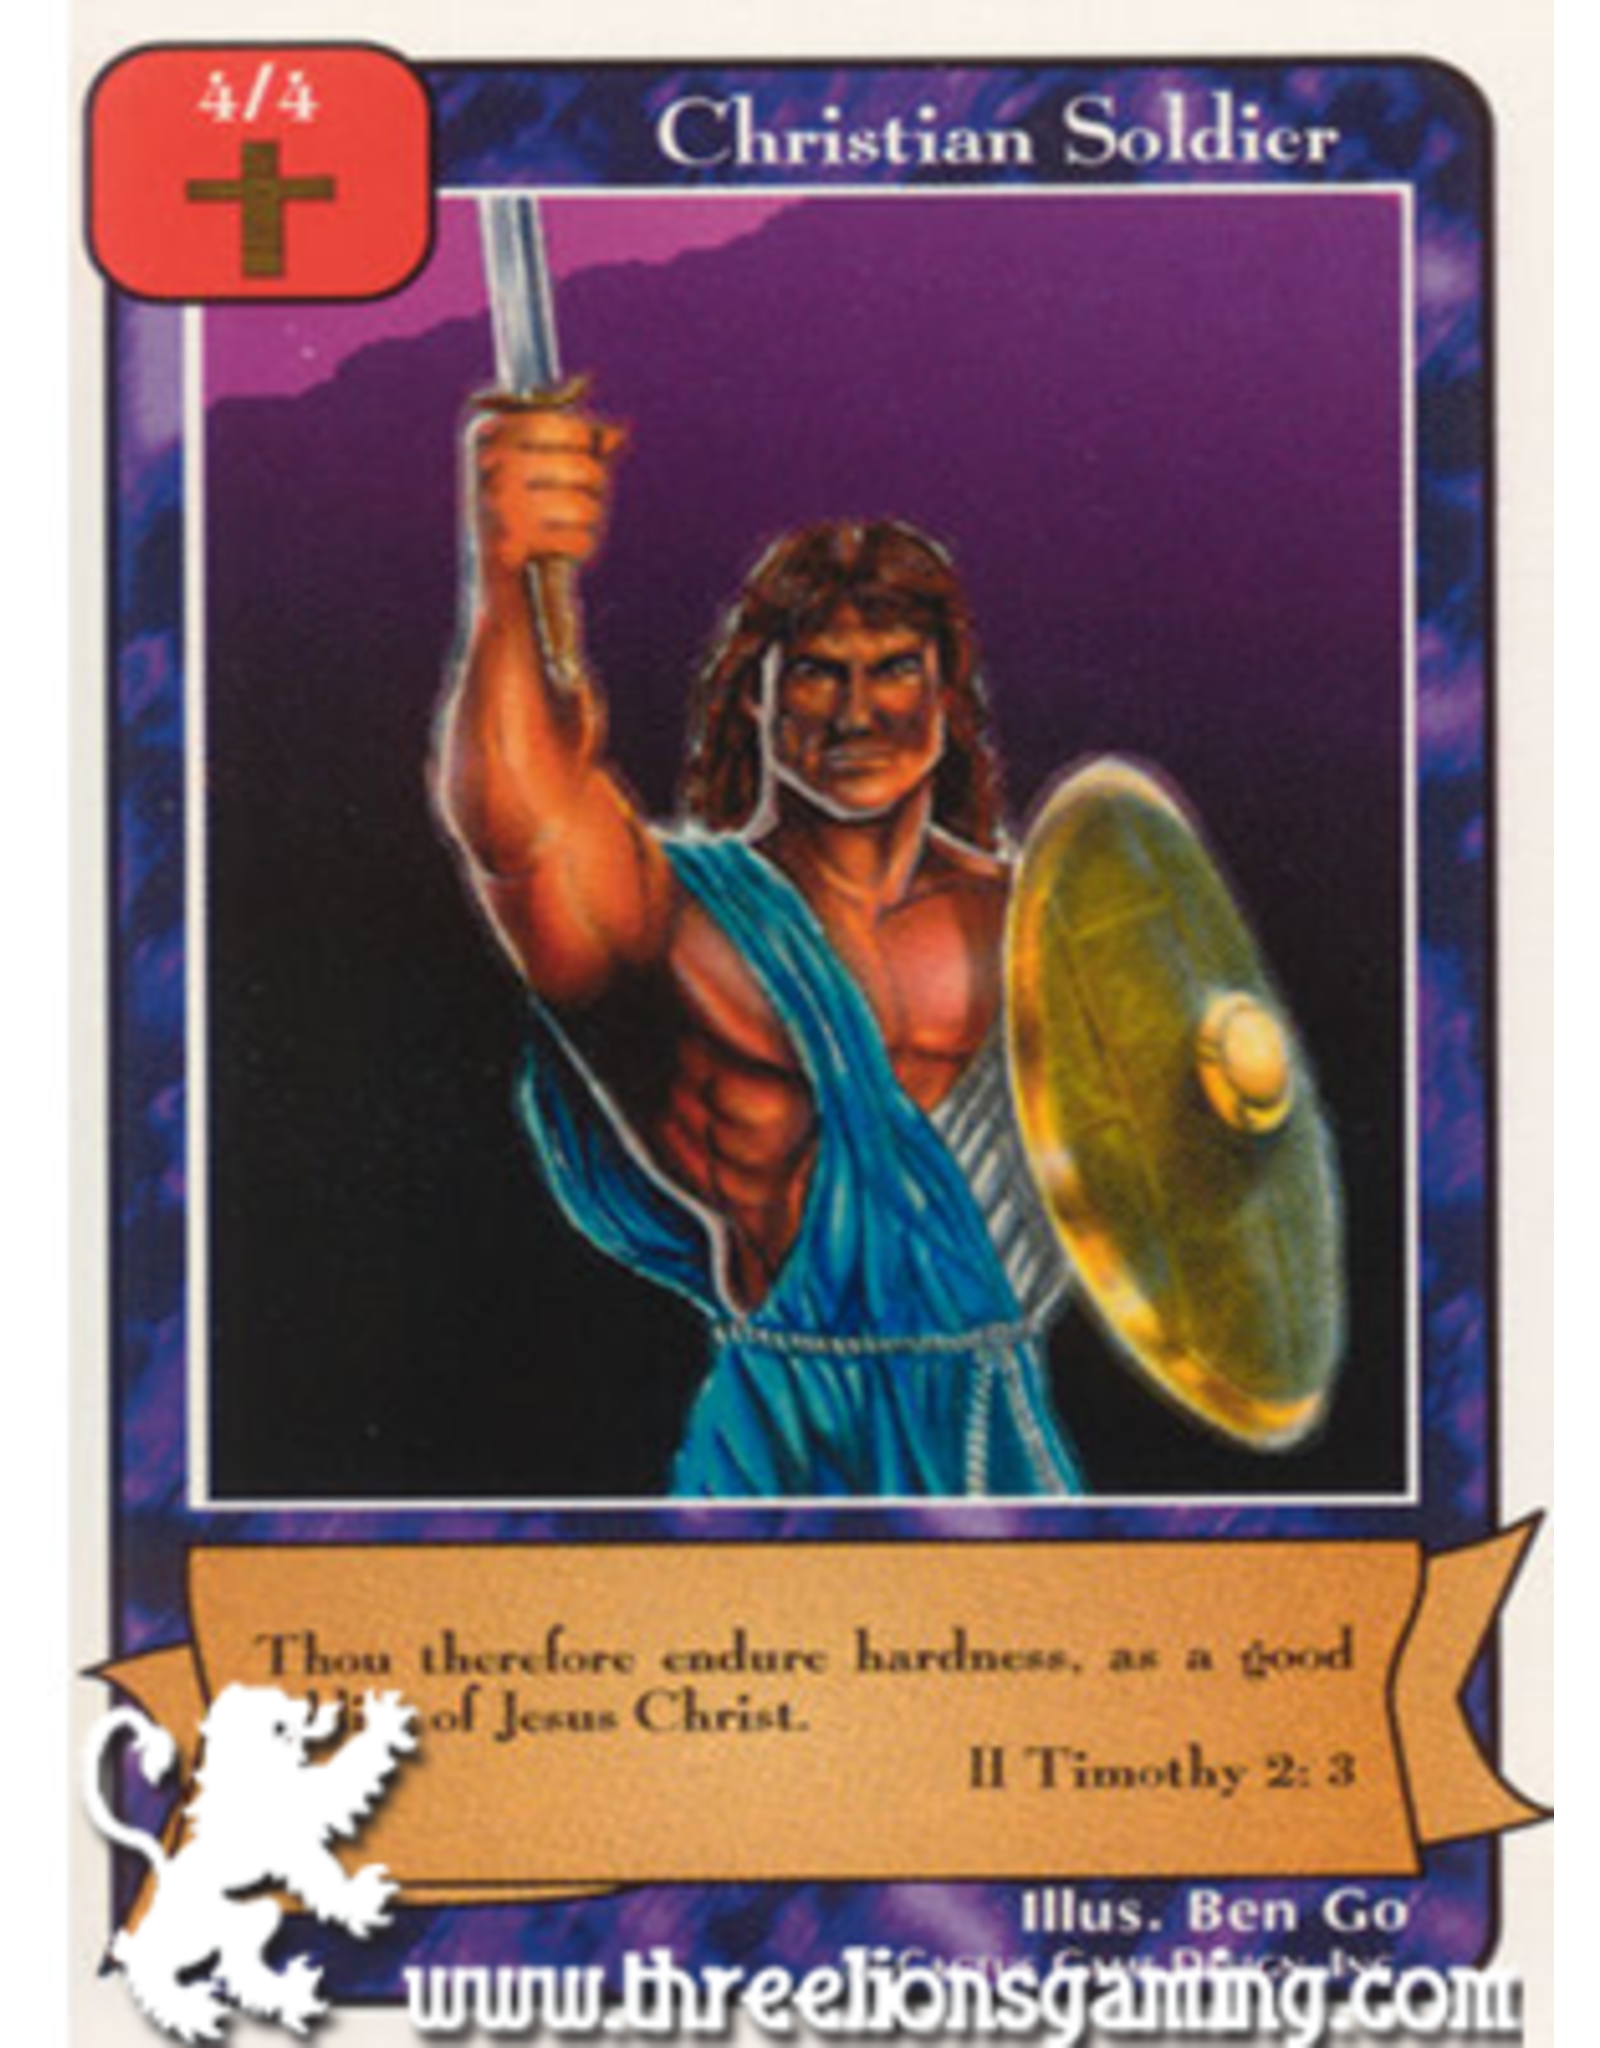 Orig: Christian Soldier